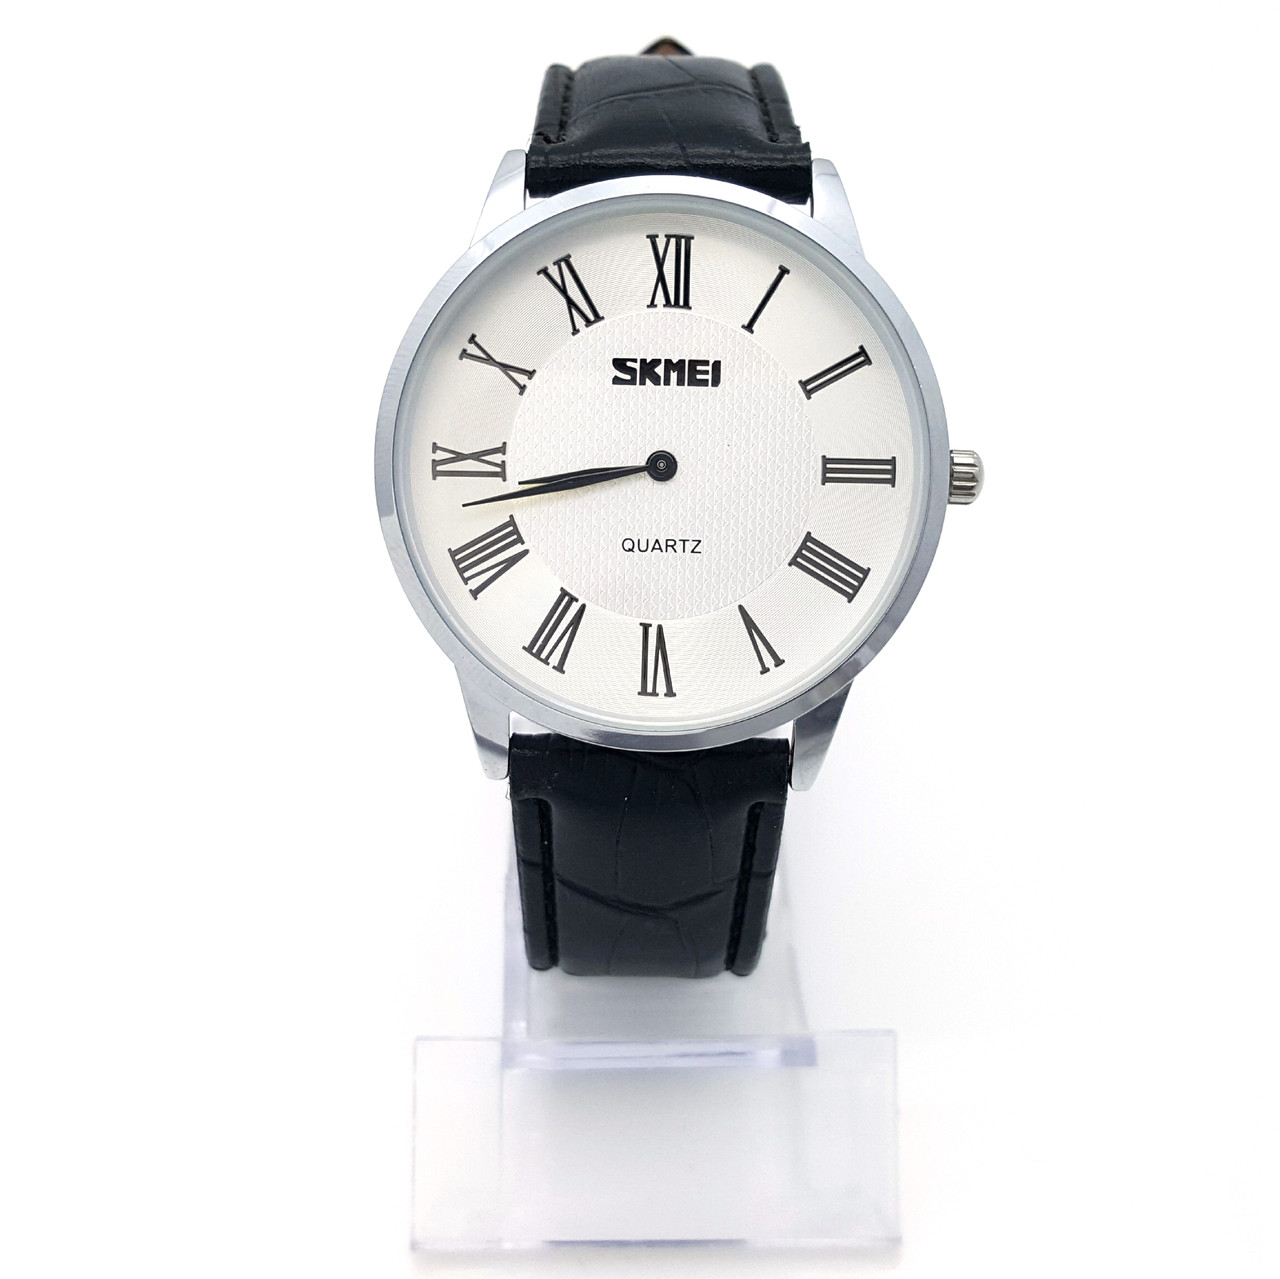 Часы Skmei серебристые, на черном ремешке, длина 18,5-23см, циферблат 39мм